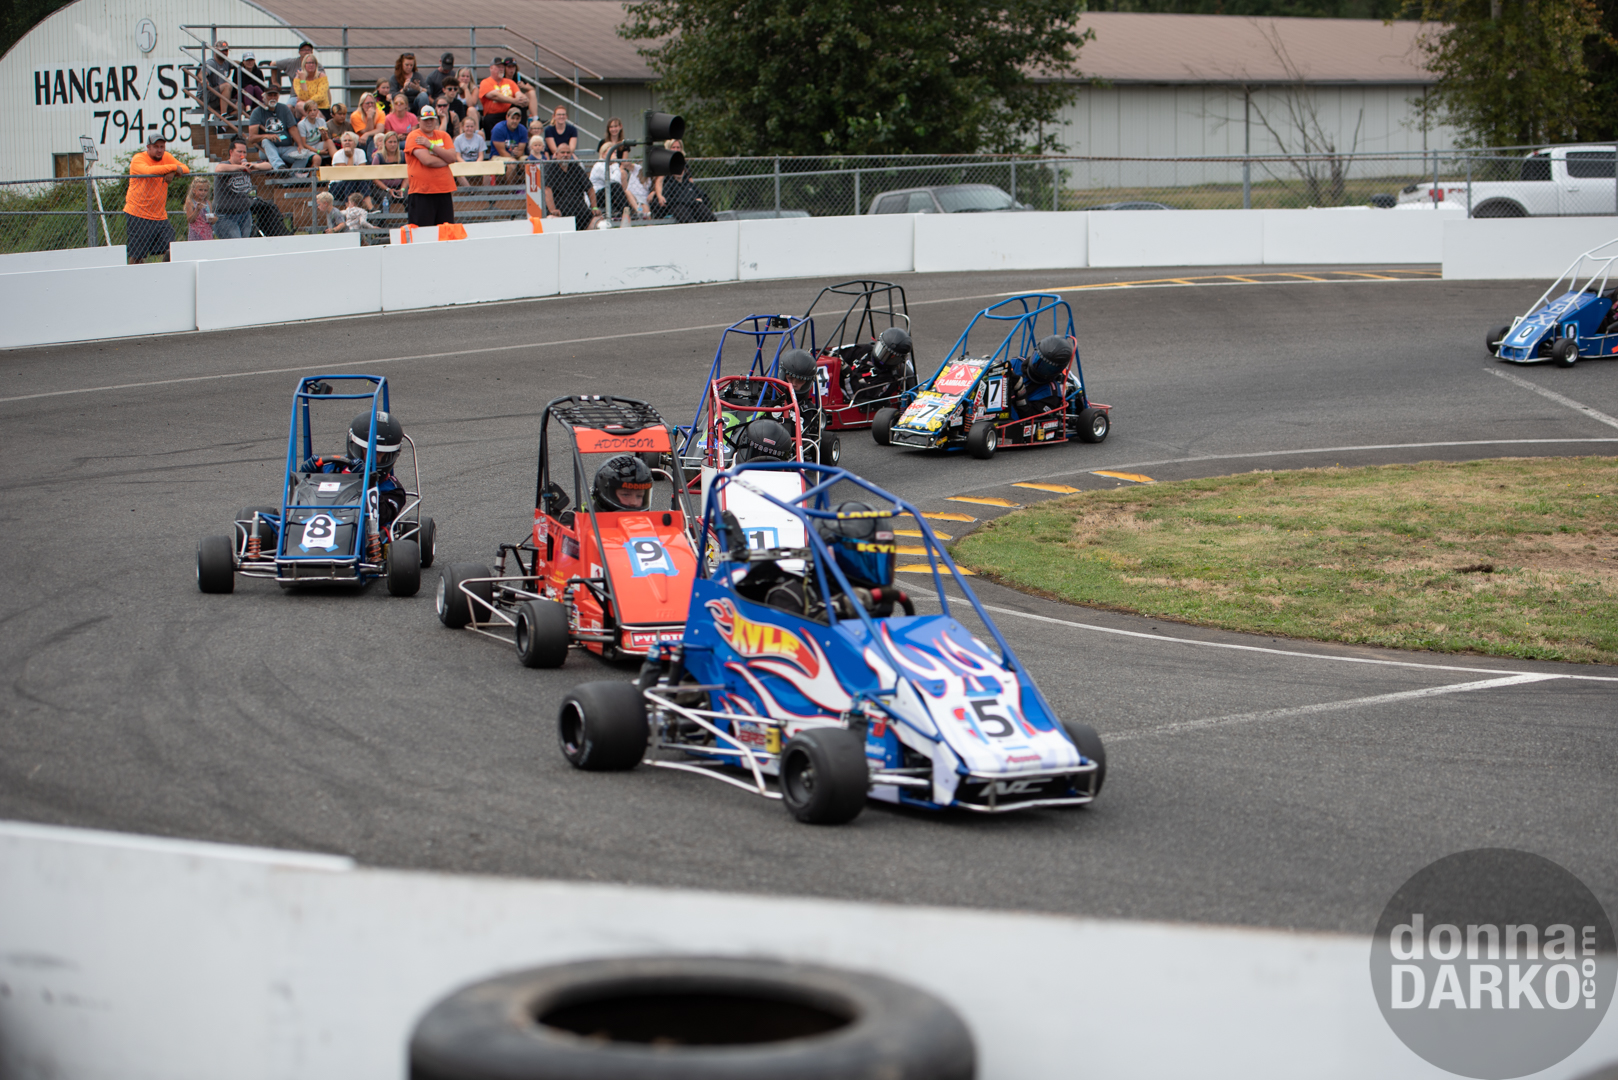 QWMA (Racing) 8-11-2019 DSC_7950.jpg